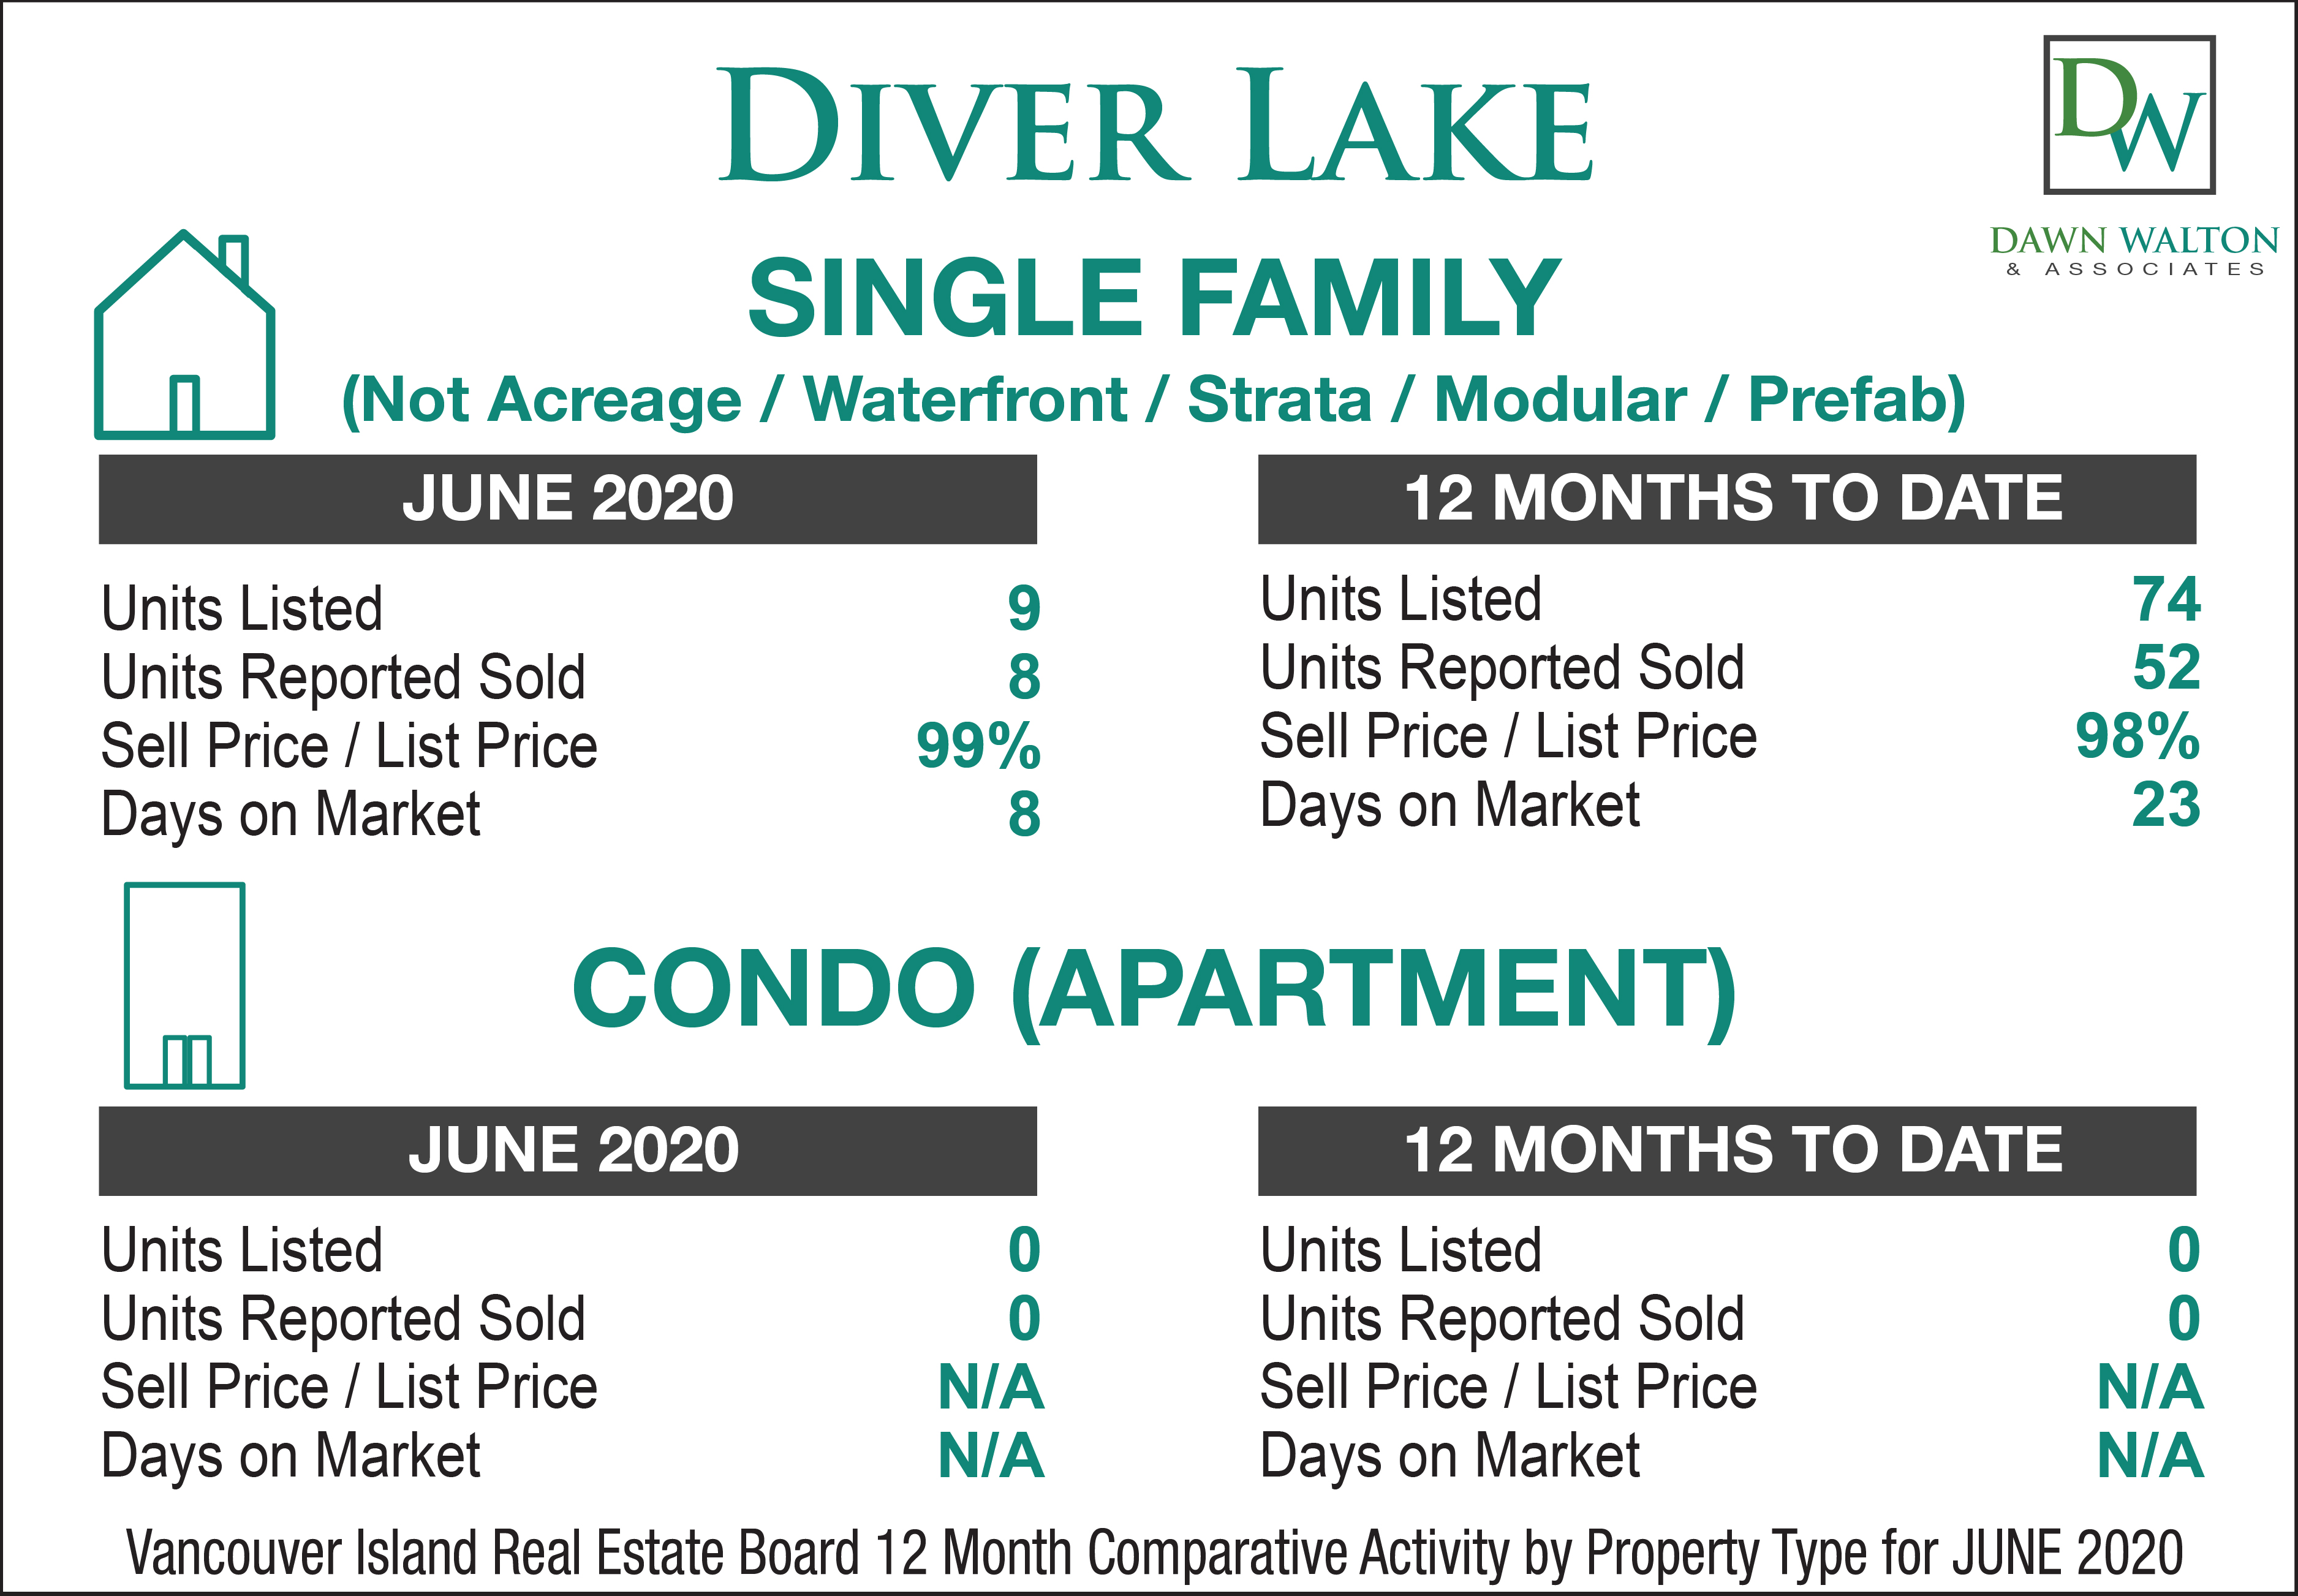 Diver Lake  Real Estate Market Stats June 2020 - Nanaimo Realtor Dawn Walton